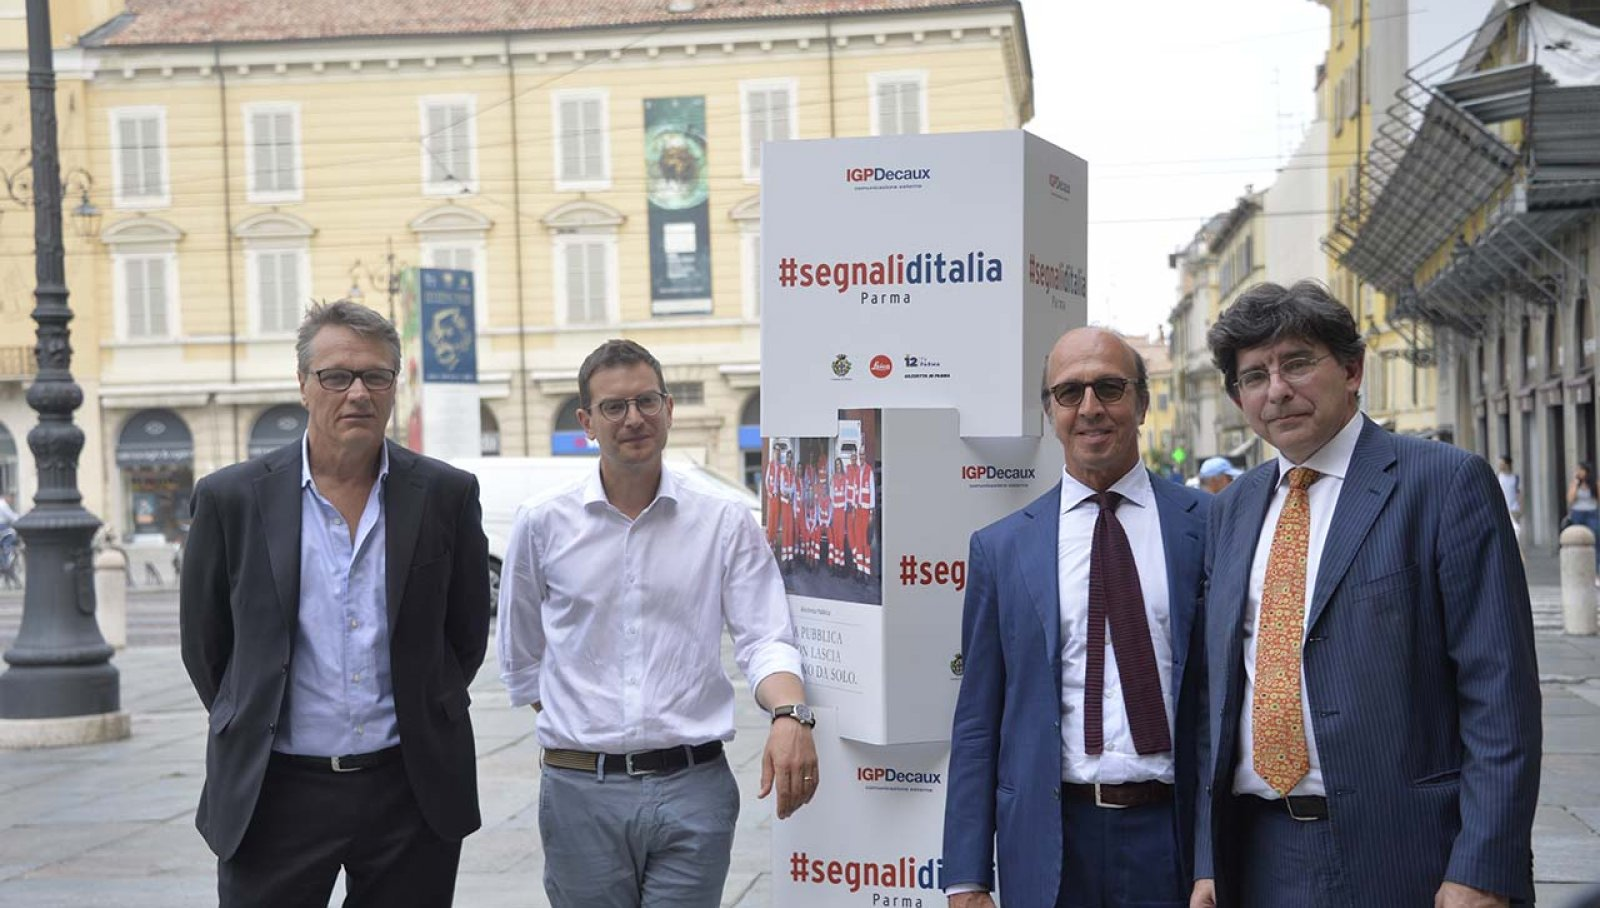 Campagna_Segnali_D'Italia_IGPDecaux_Parma_2018